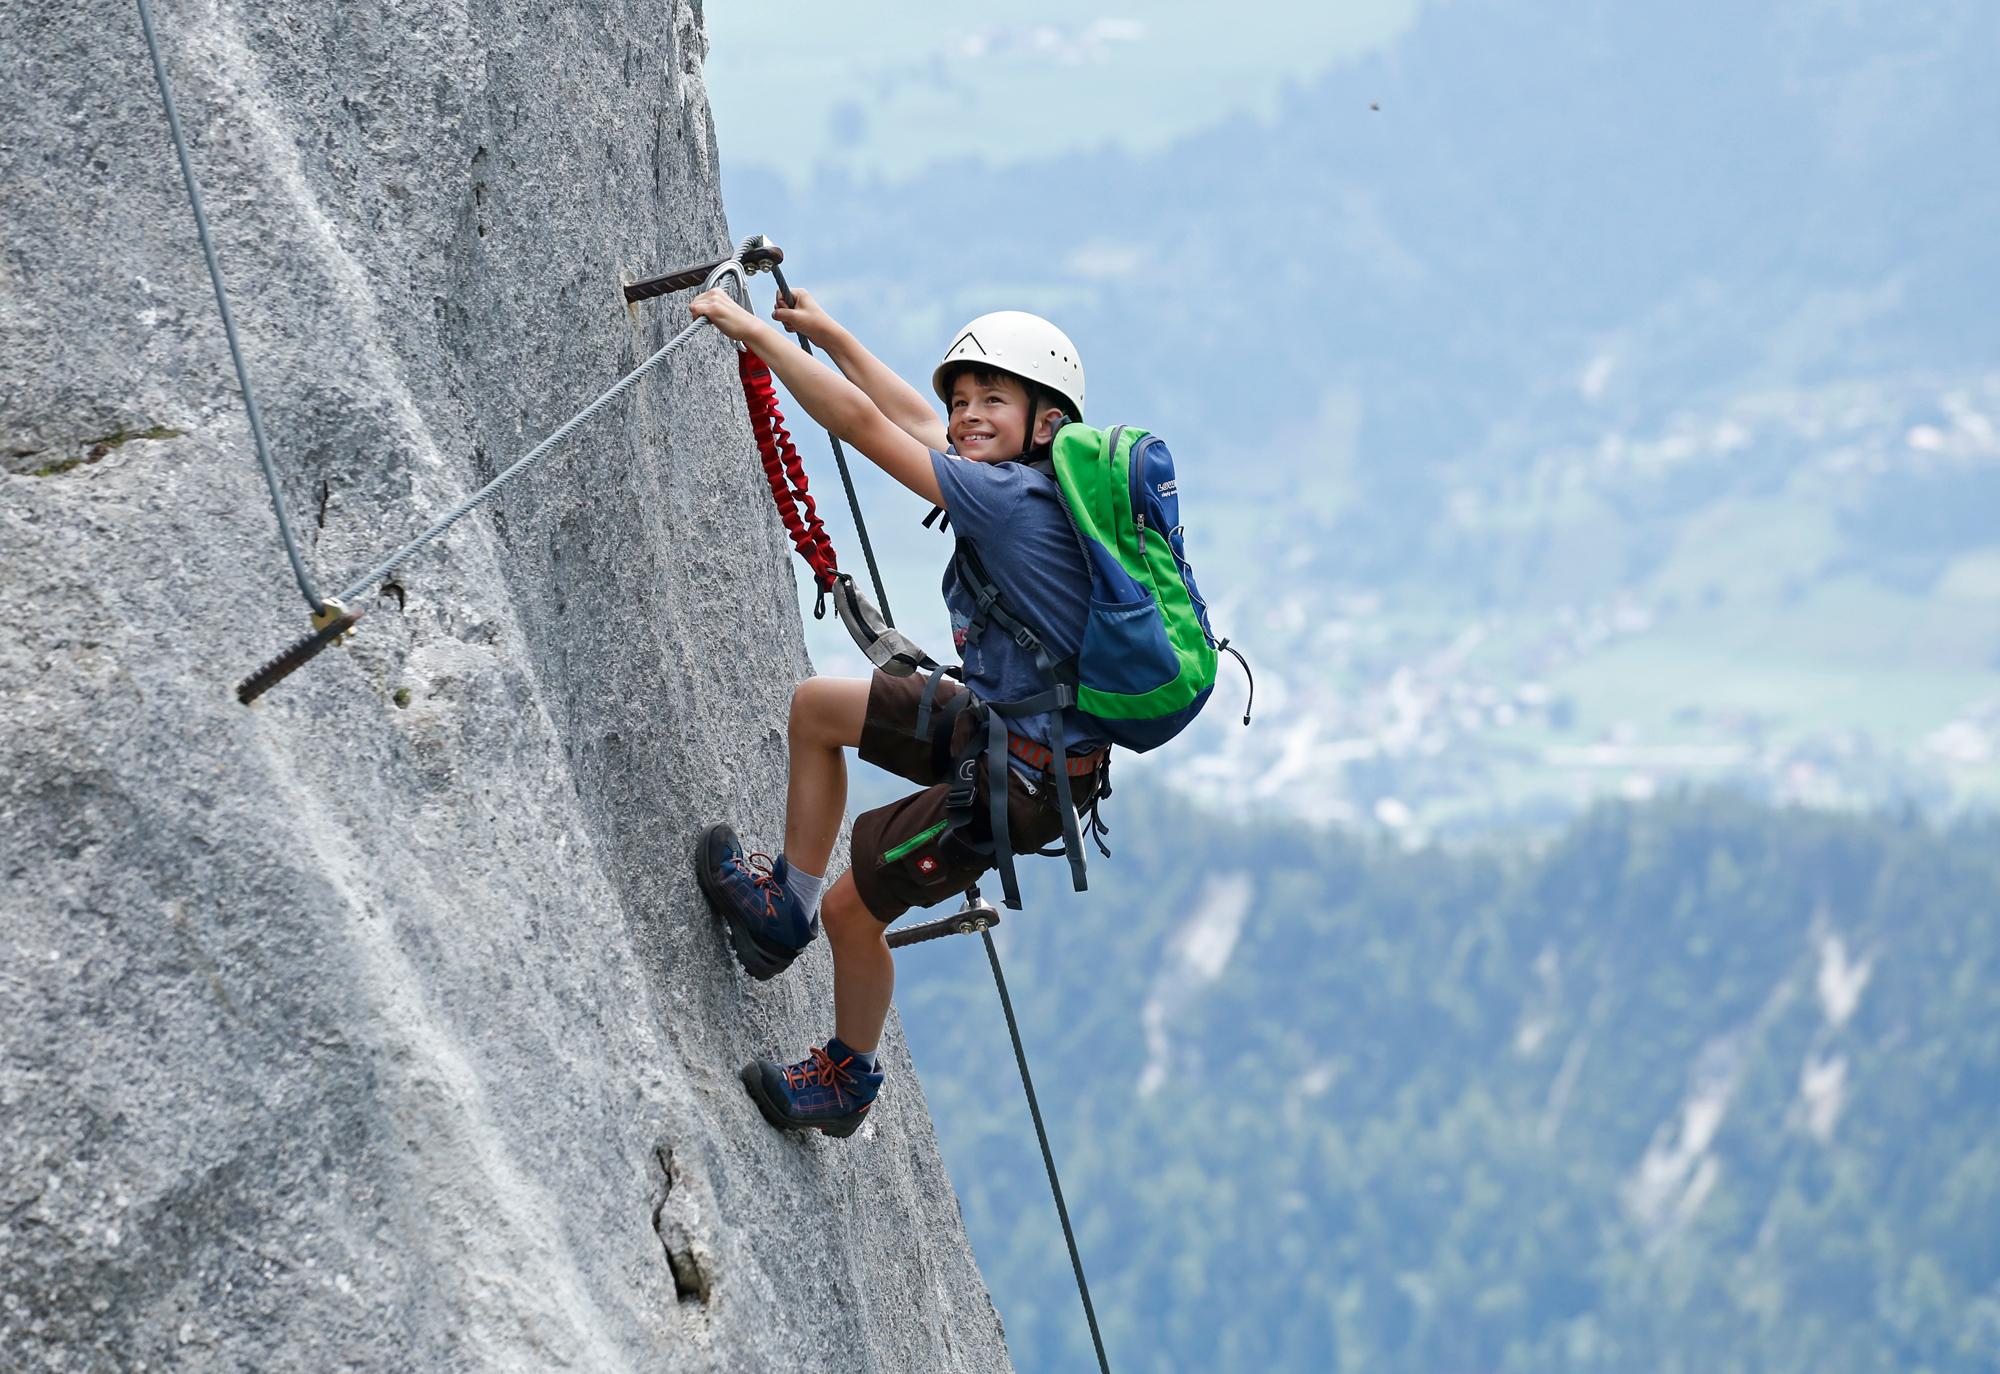 Klettergurt Kinder Größe : Mit kindern am klettersteig